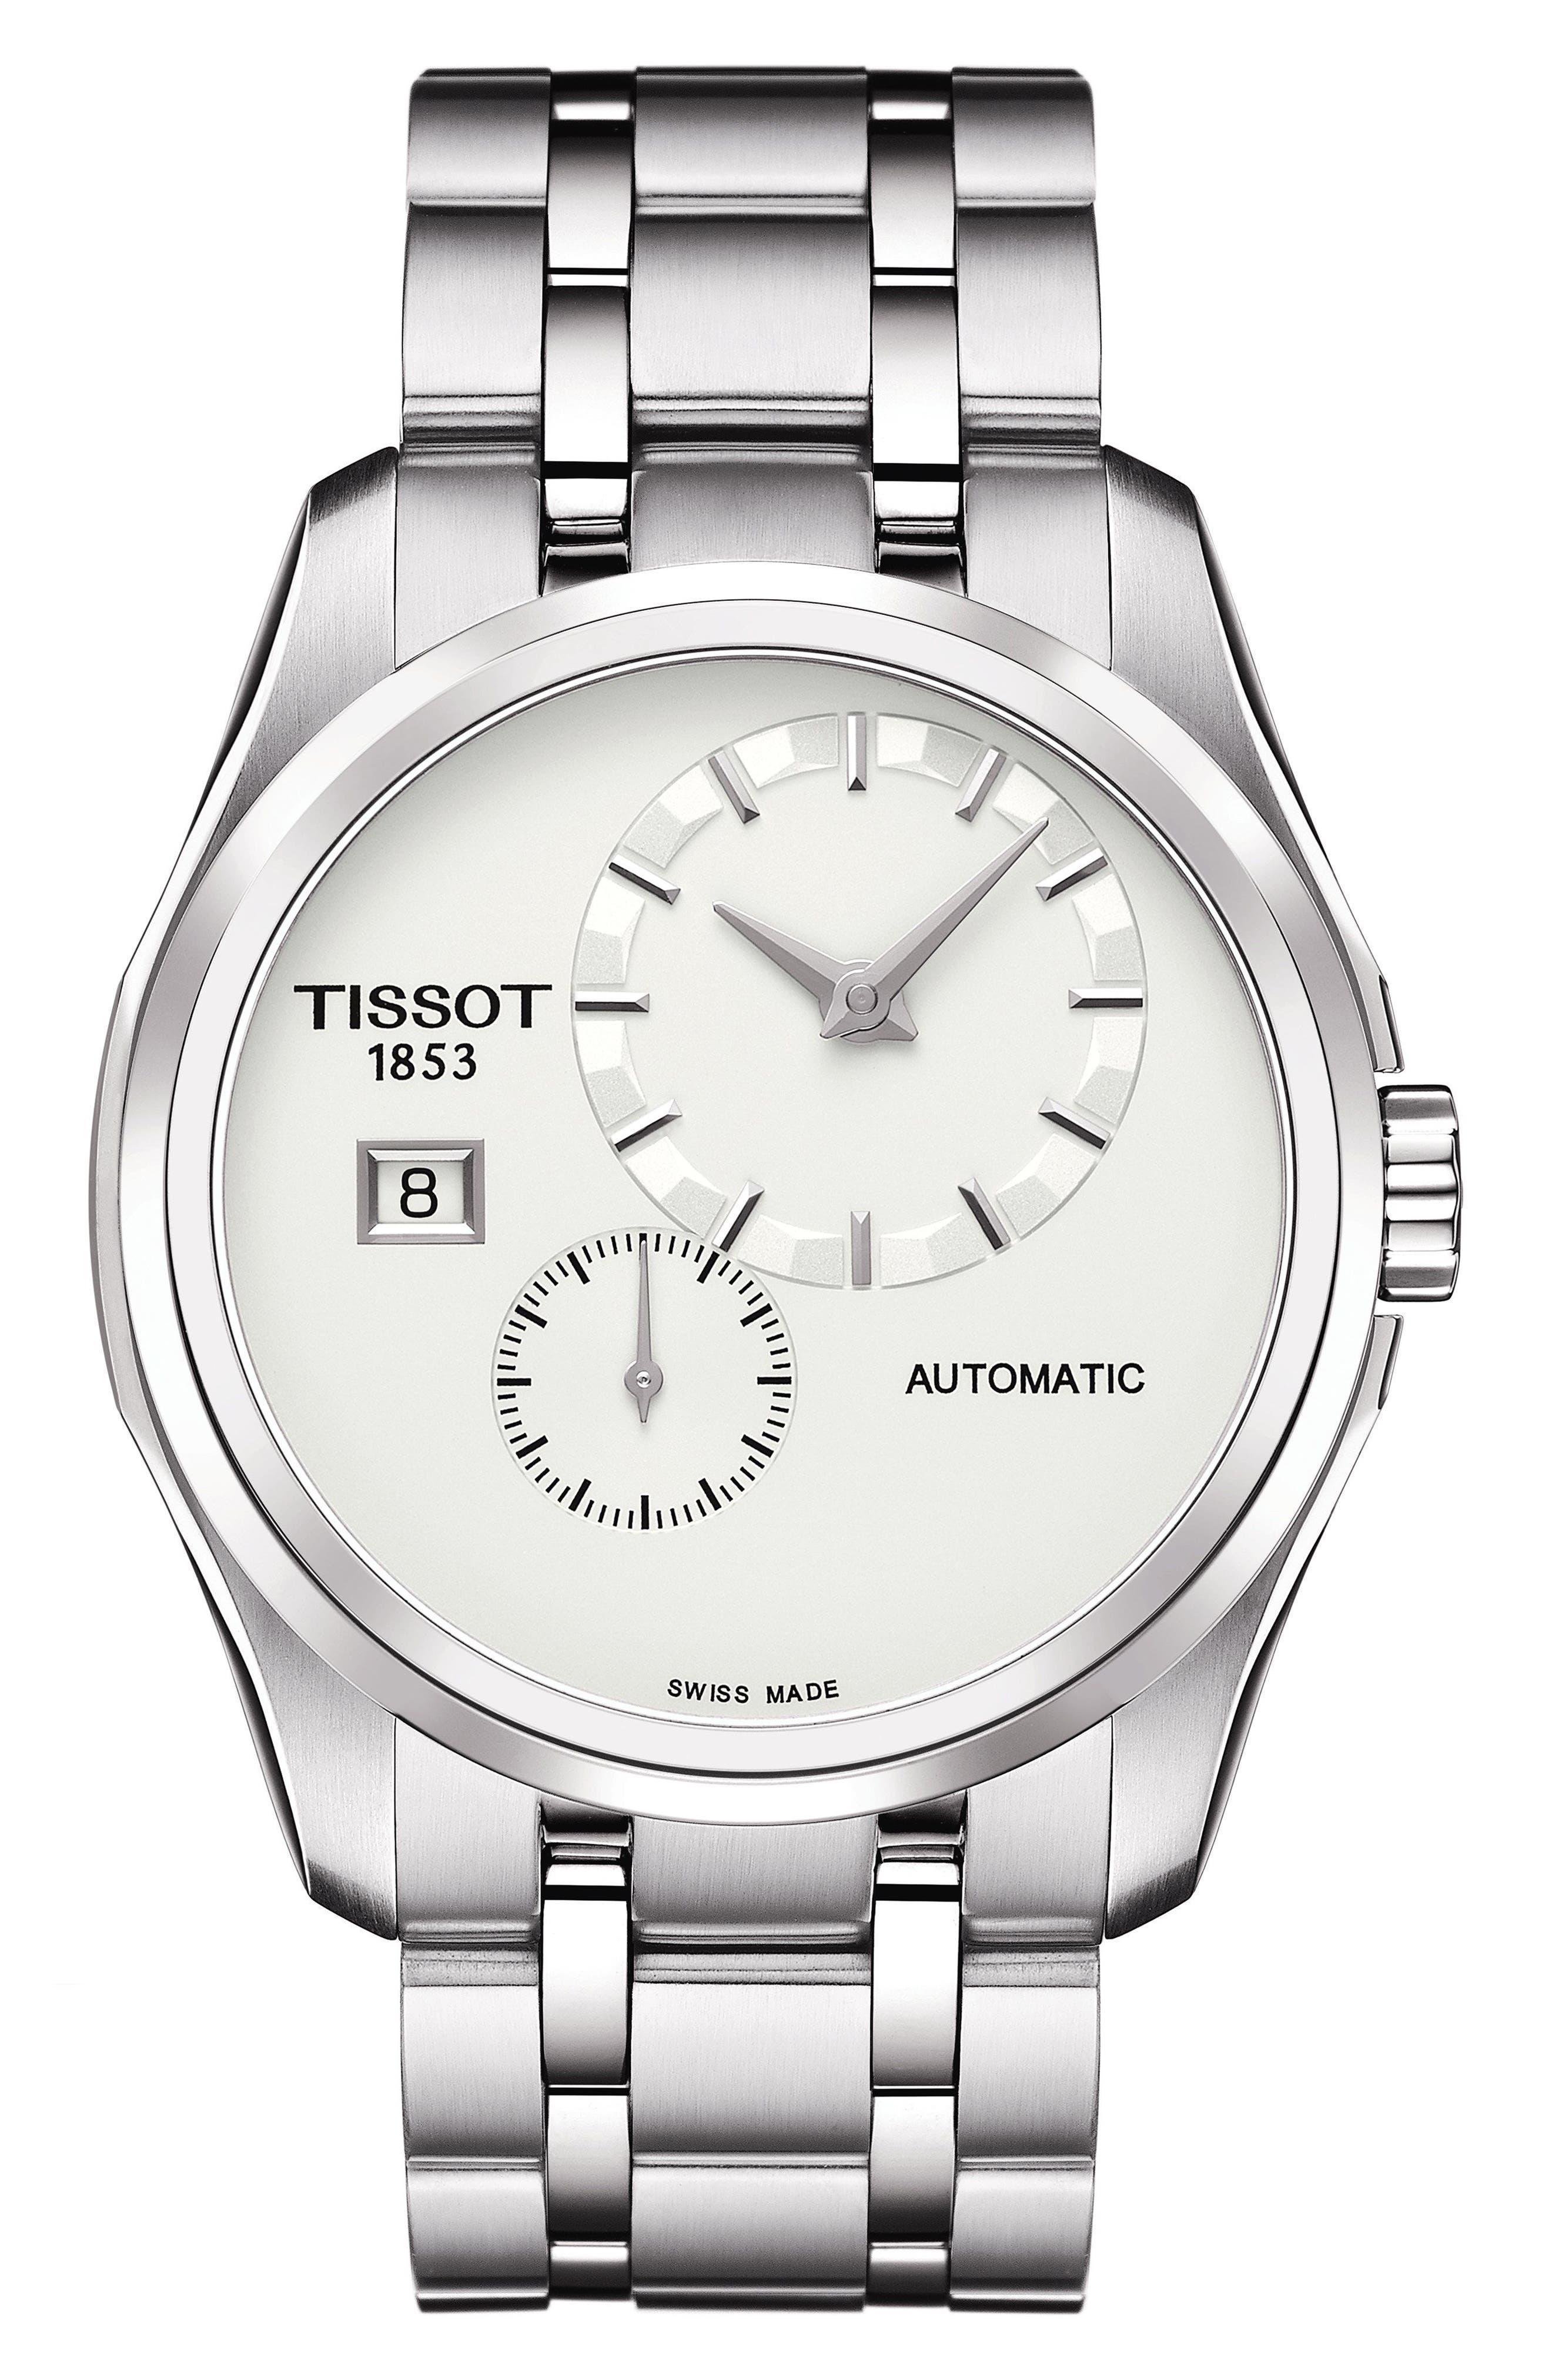 Image of Tissot Men's Couturier Automatic Bracelet Watch, 39mm